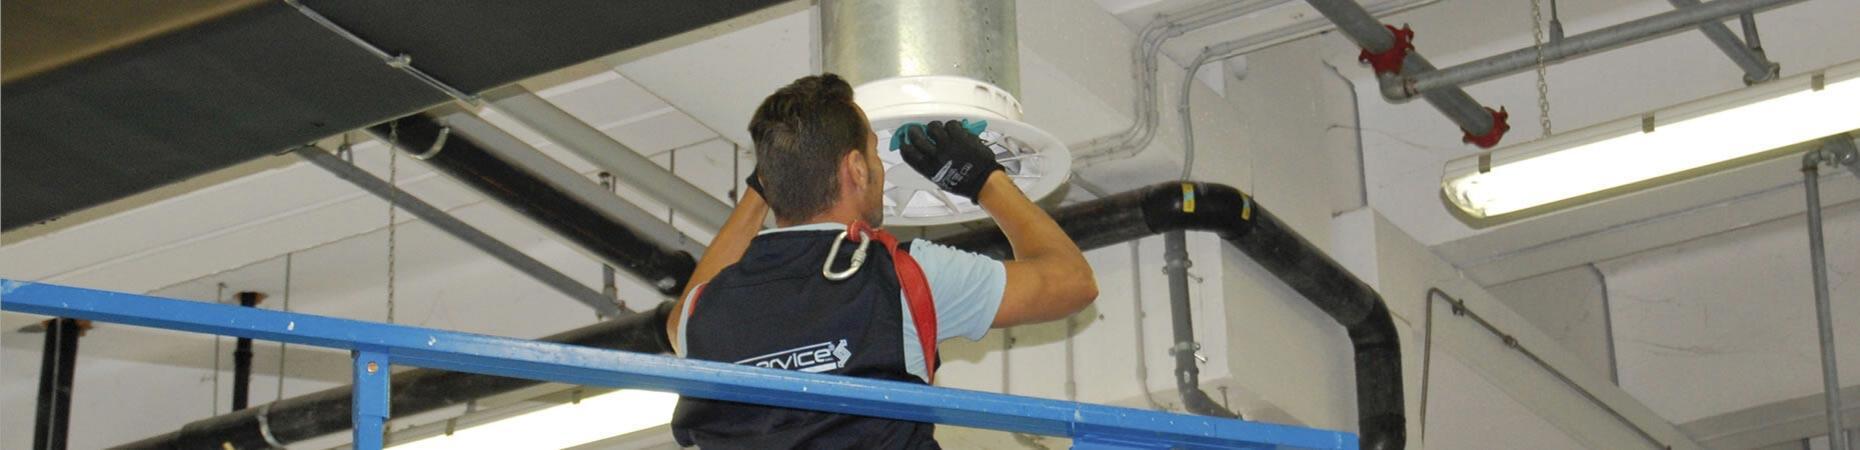 ecoservice-ancona it impresa-di-pulizie-industrie-ancona 005